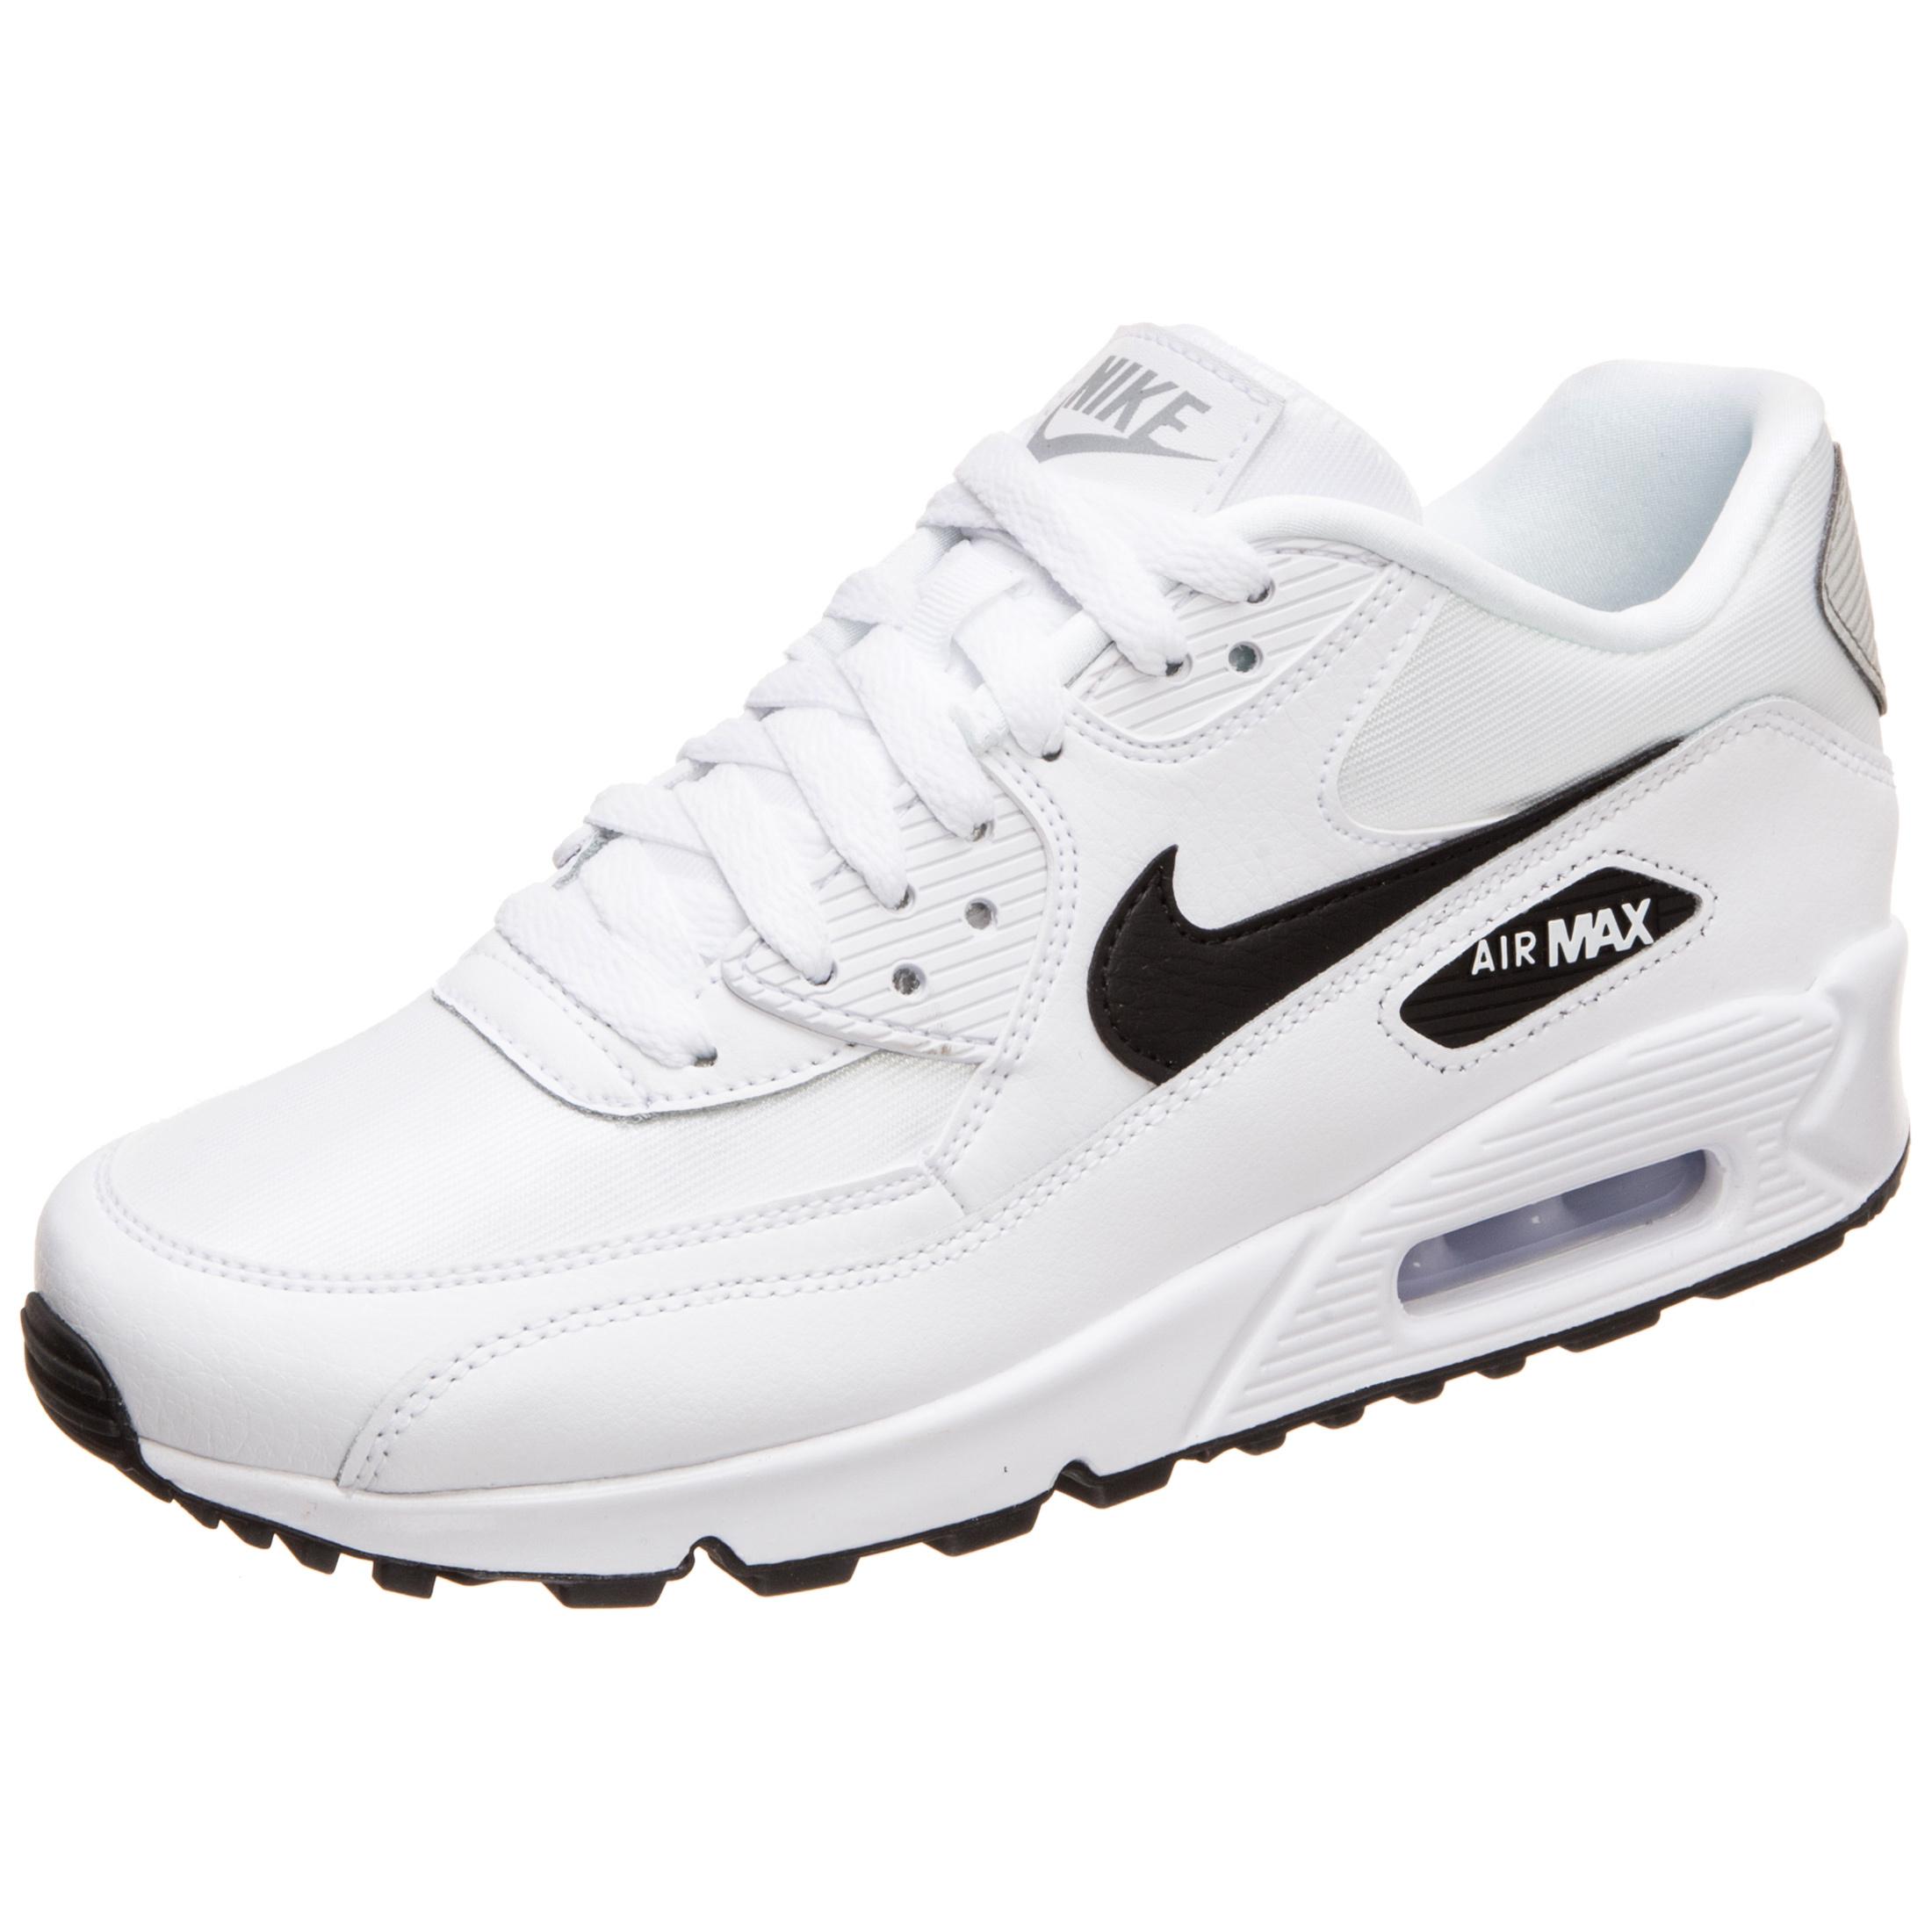 newest collection 994e1 8808e Nike Air Max 90 Women's Shoe - White